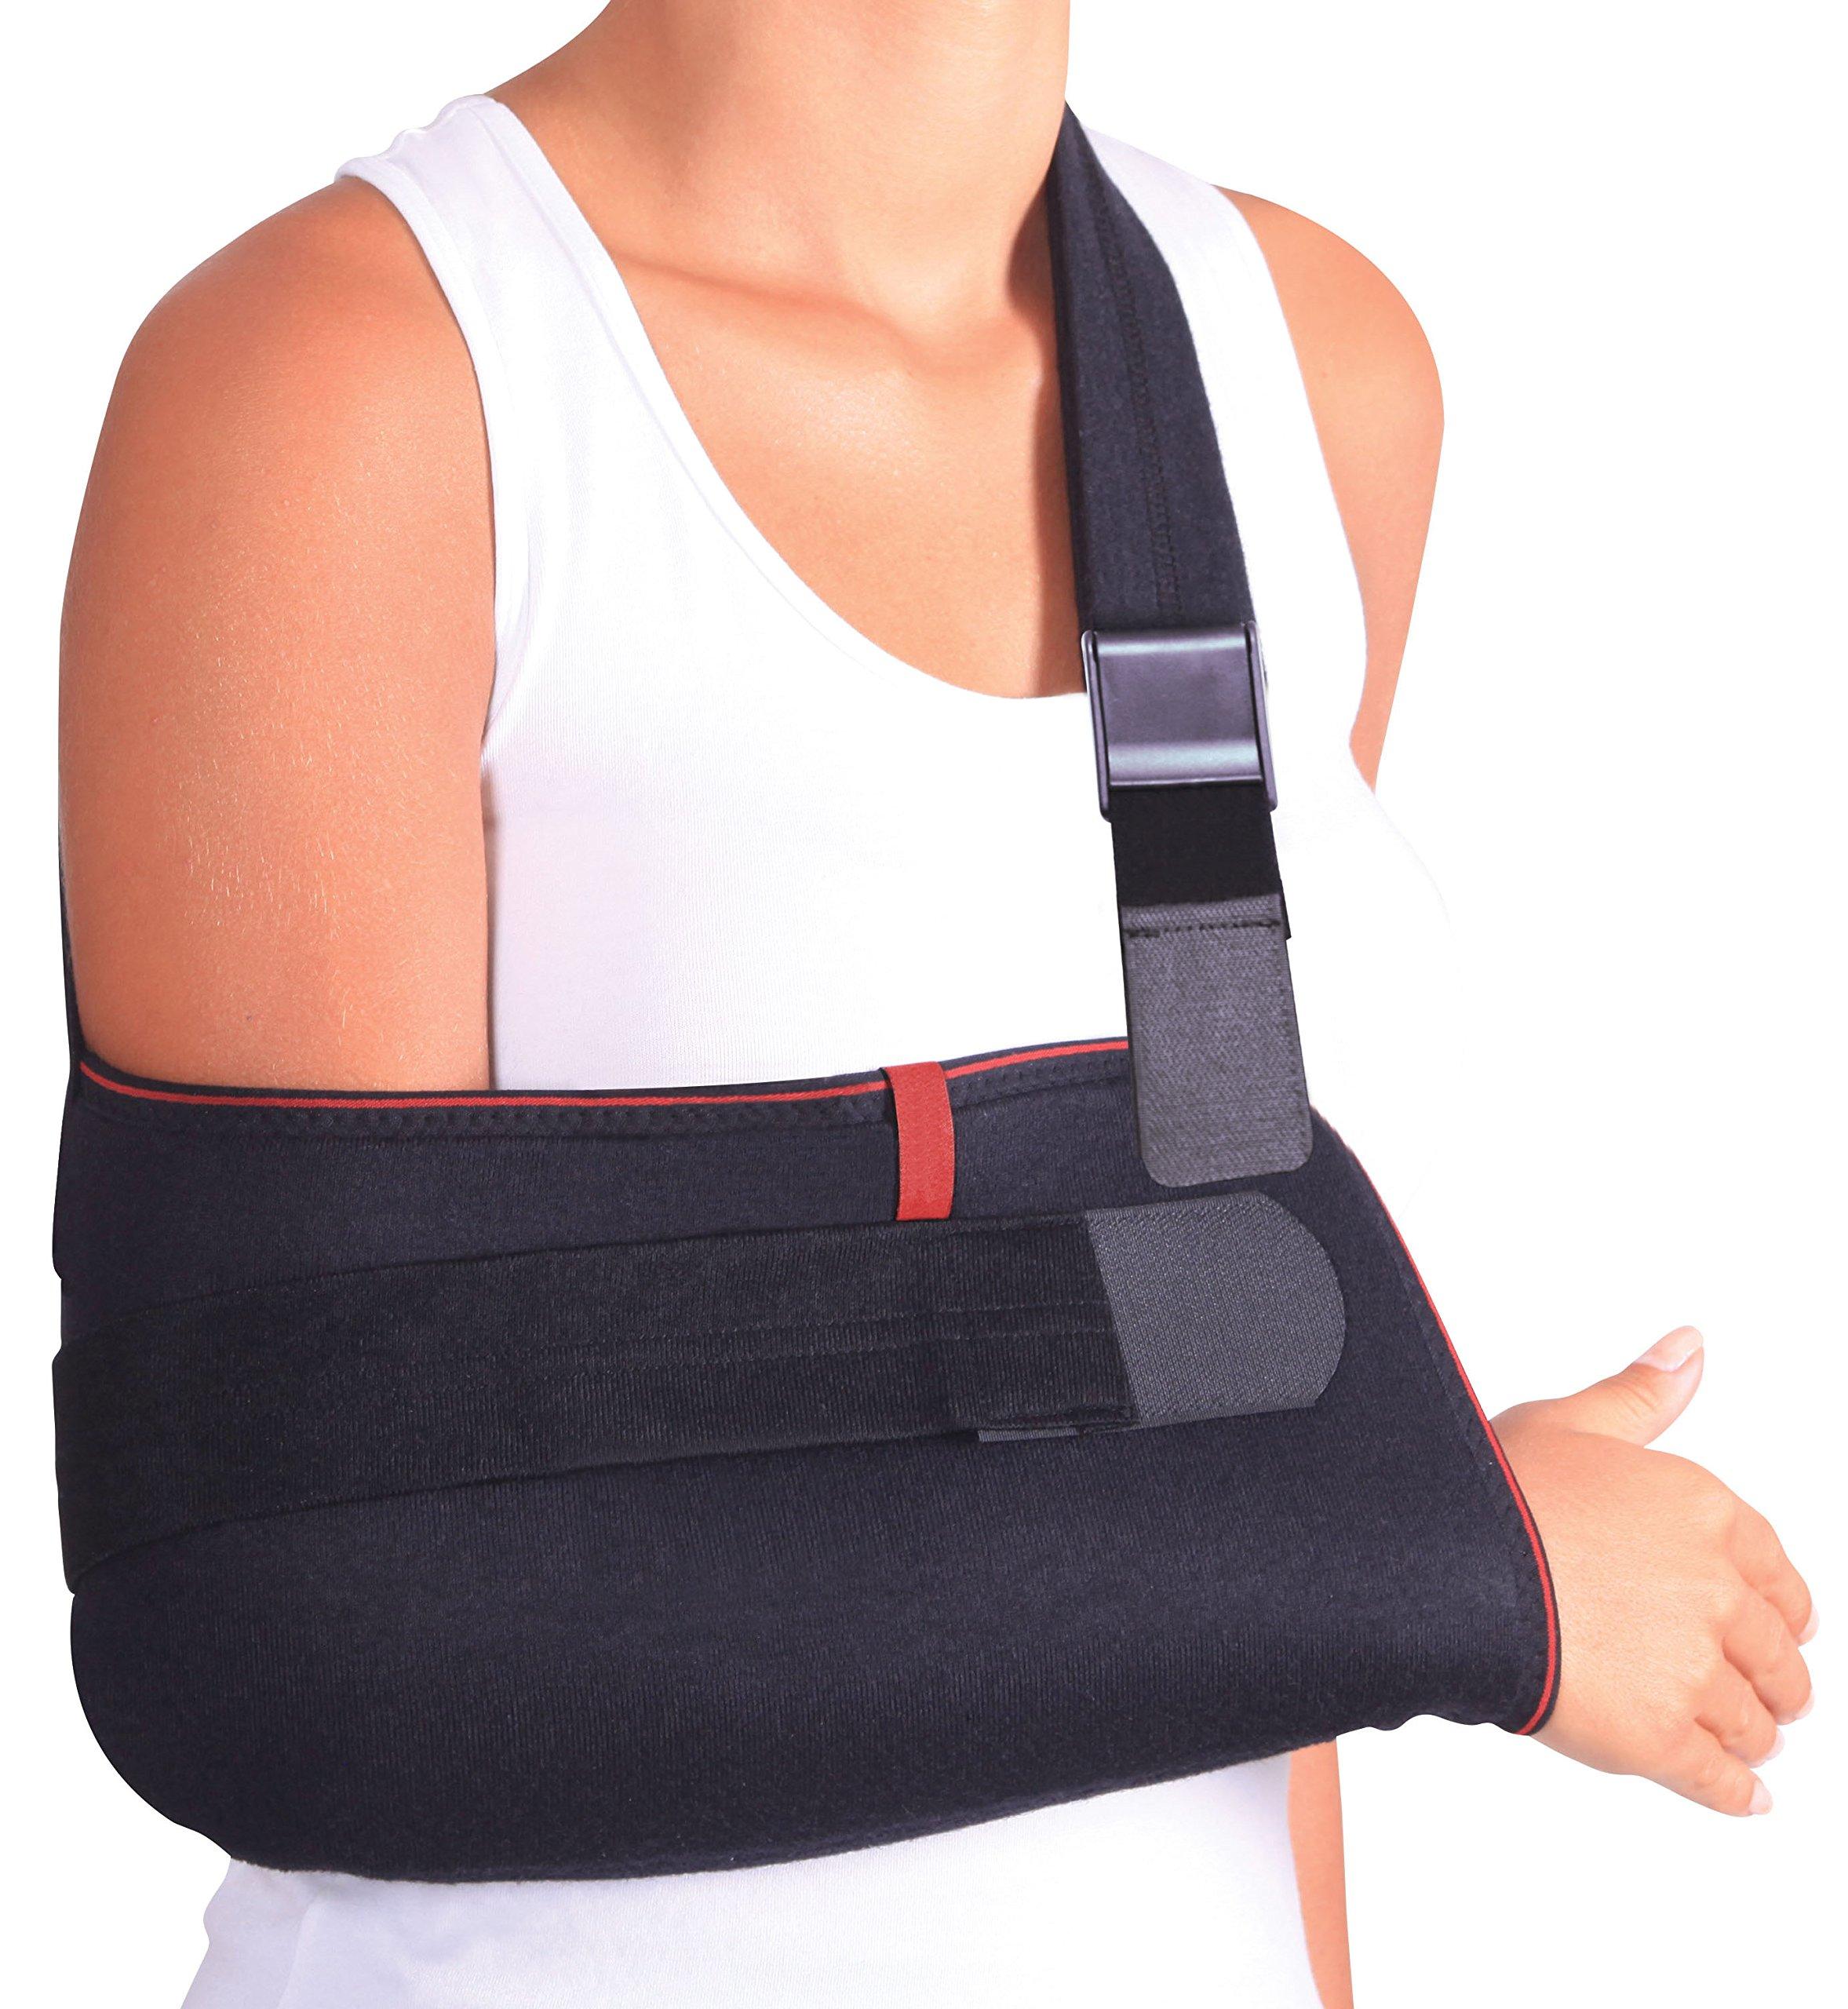 ORTONYX Arm Support Sling Shoulder Immobilizer Brace – Breathable and Lightweight – Fully Adjustable - L-XXL Black